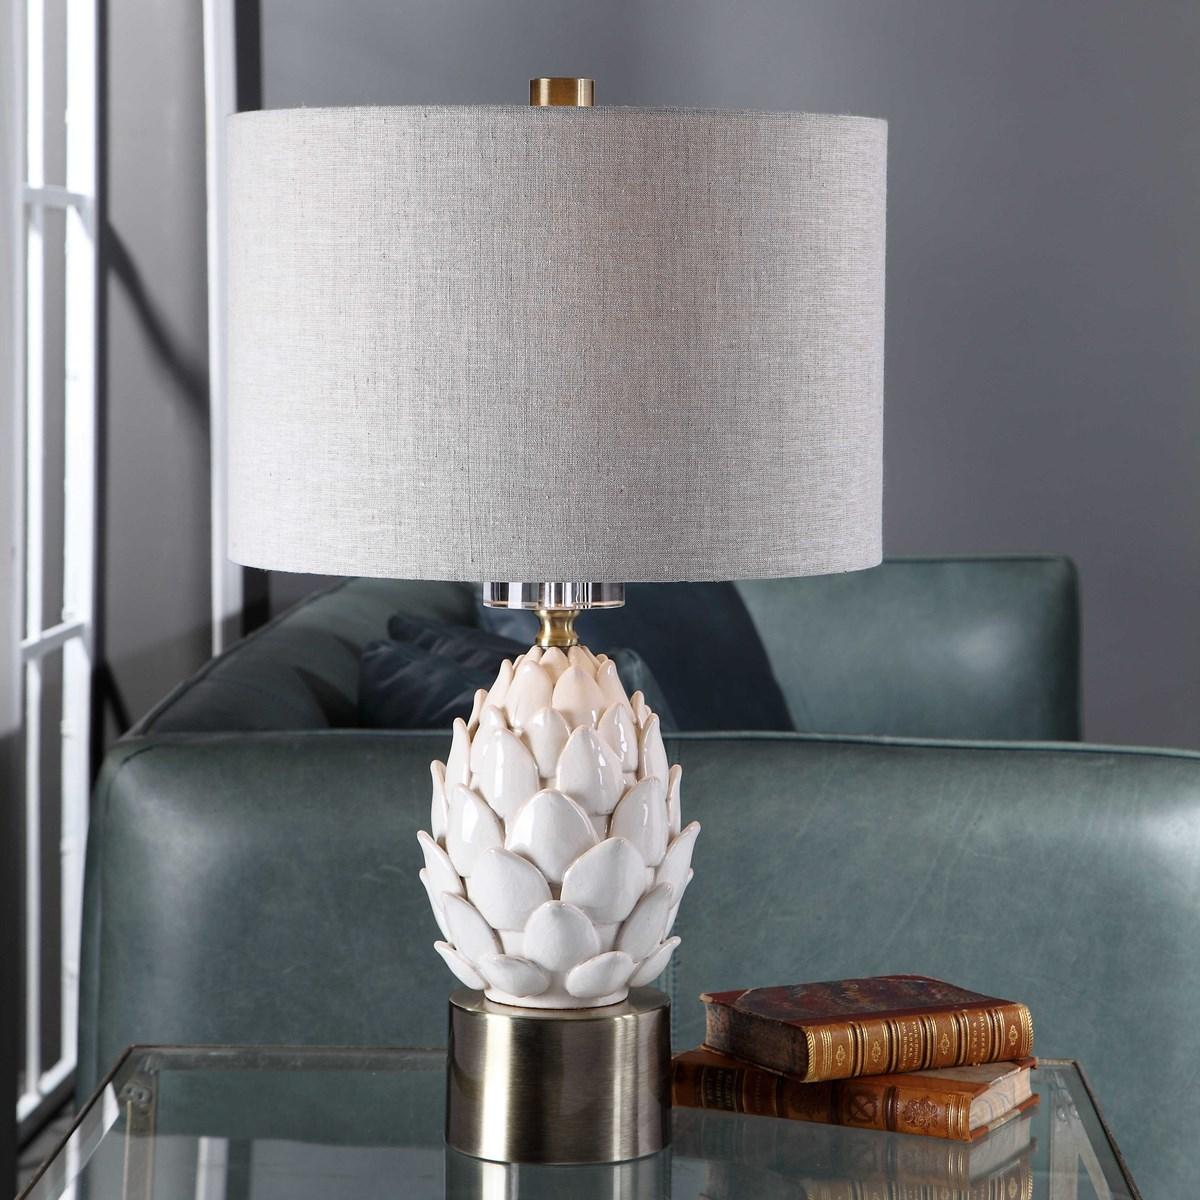 Uttermost White Artichoke Table Lamp